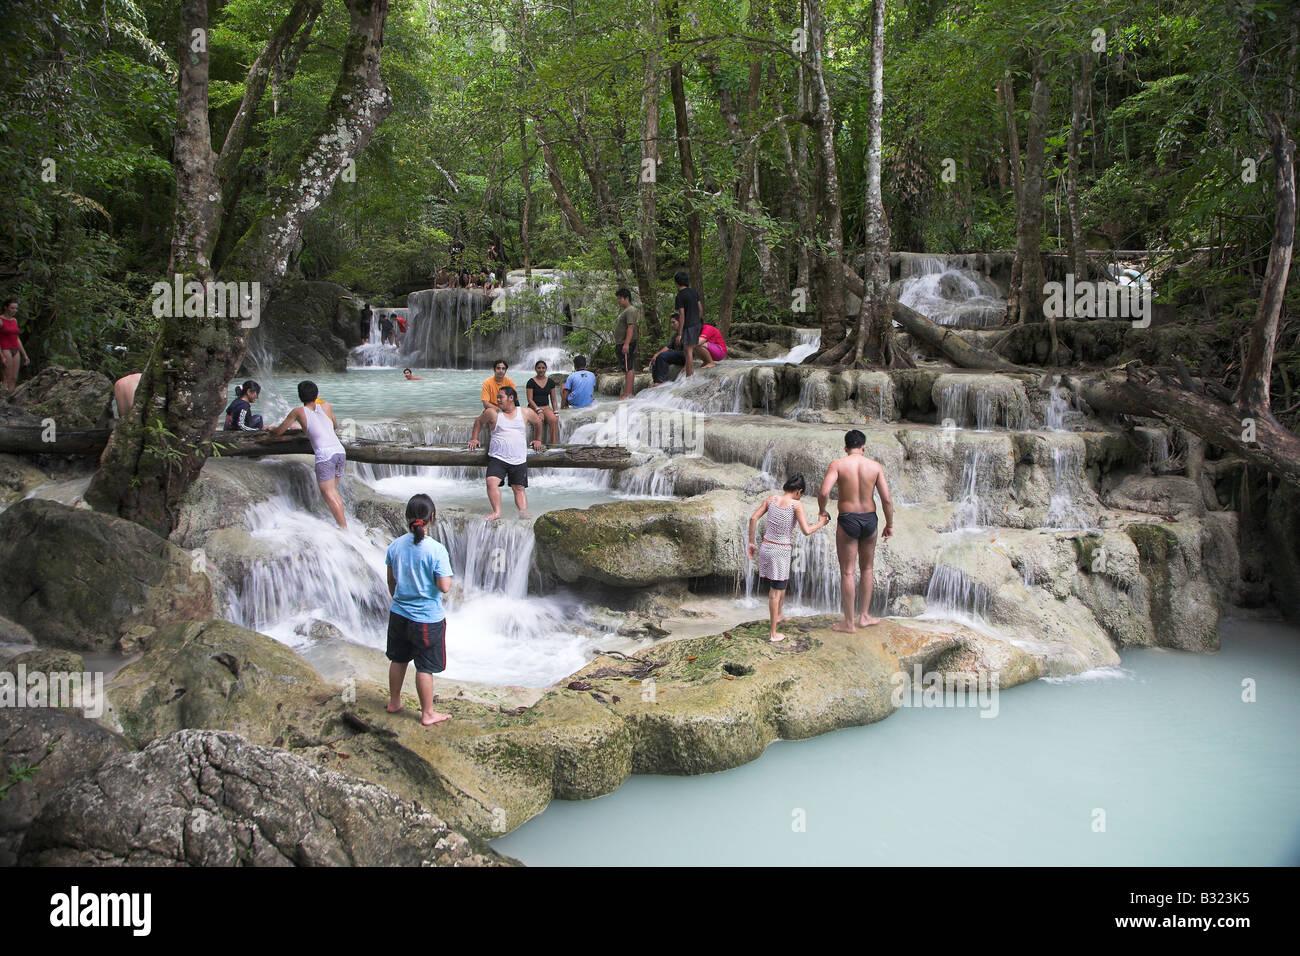 Local familes enjoying the Erawan Falls in Kanchanaburi in Thailand. - Stock Image